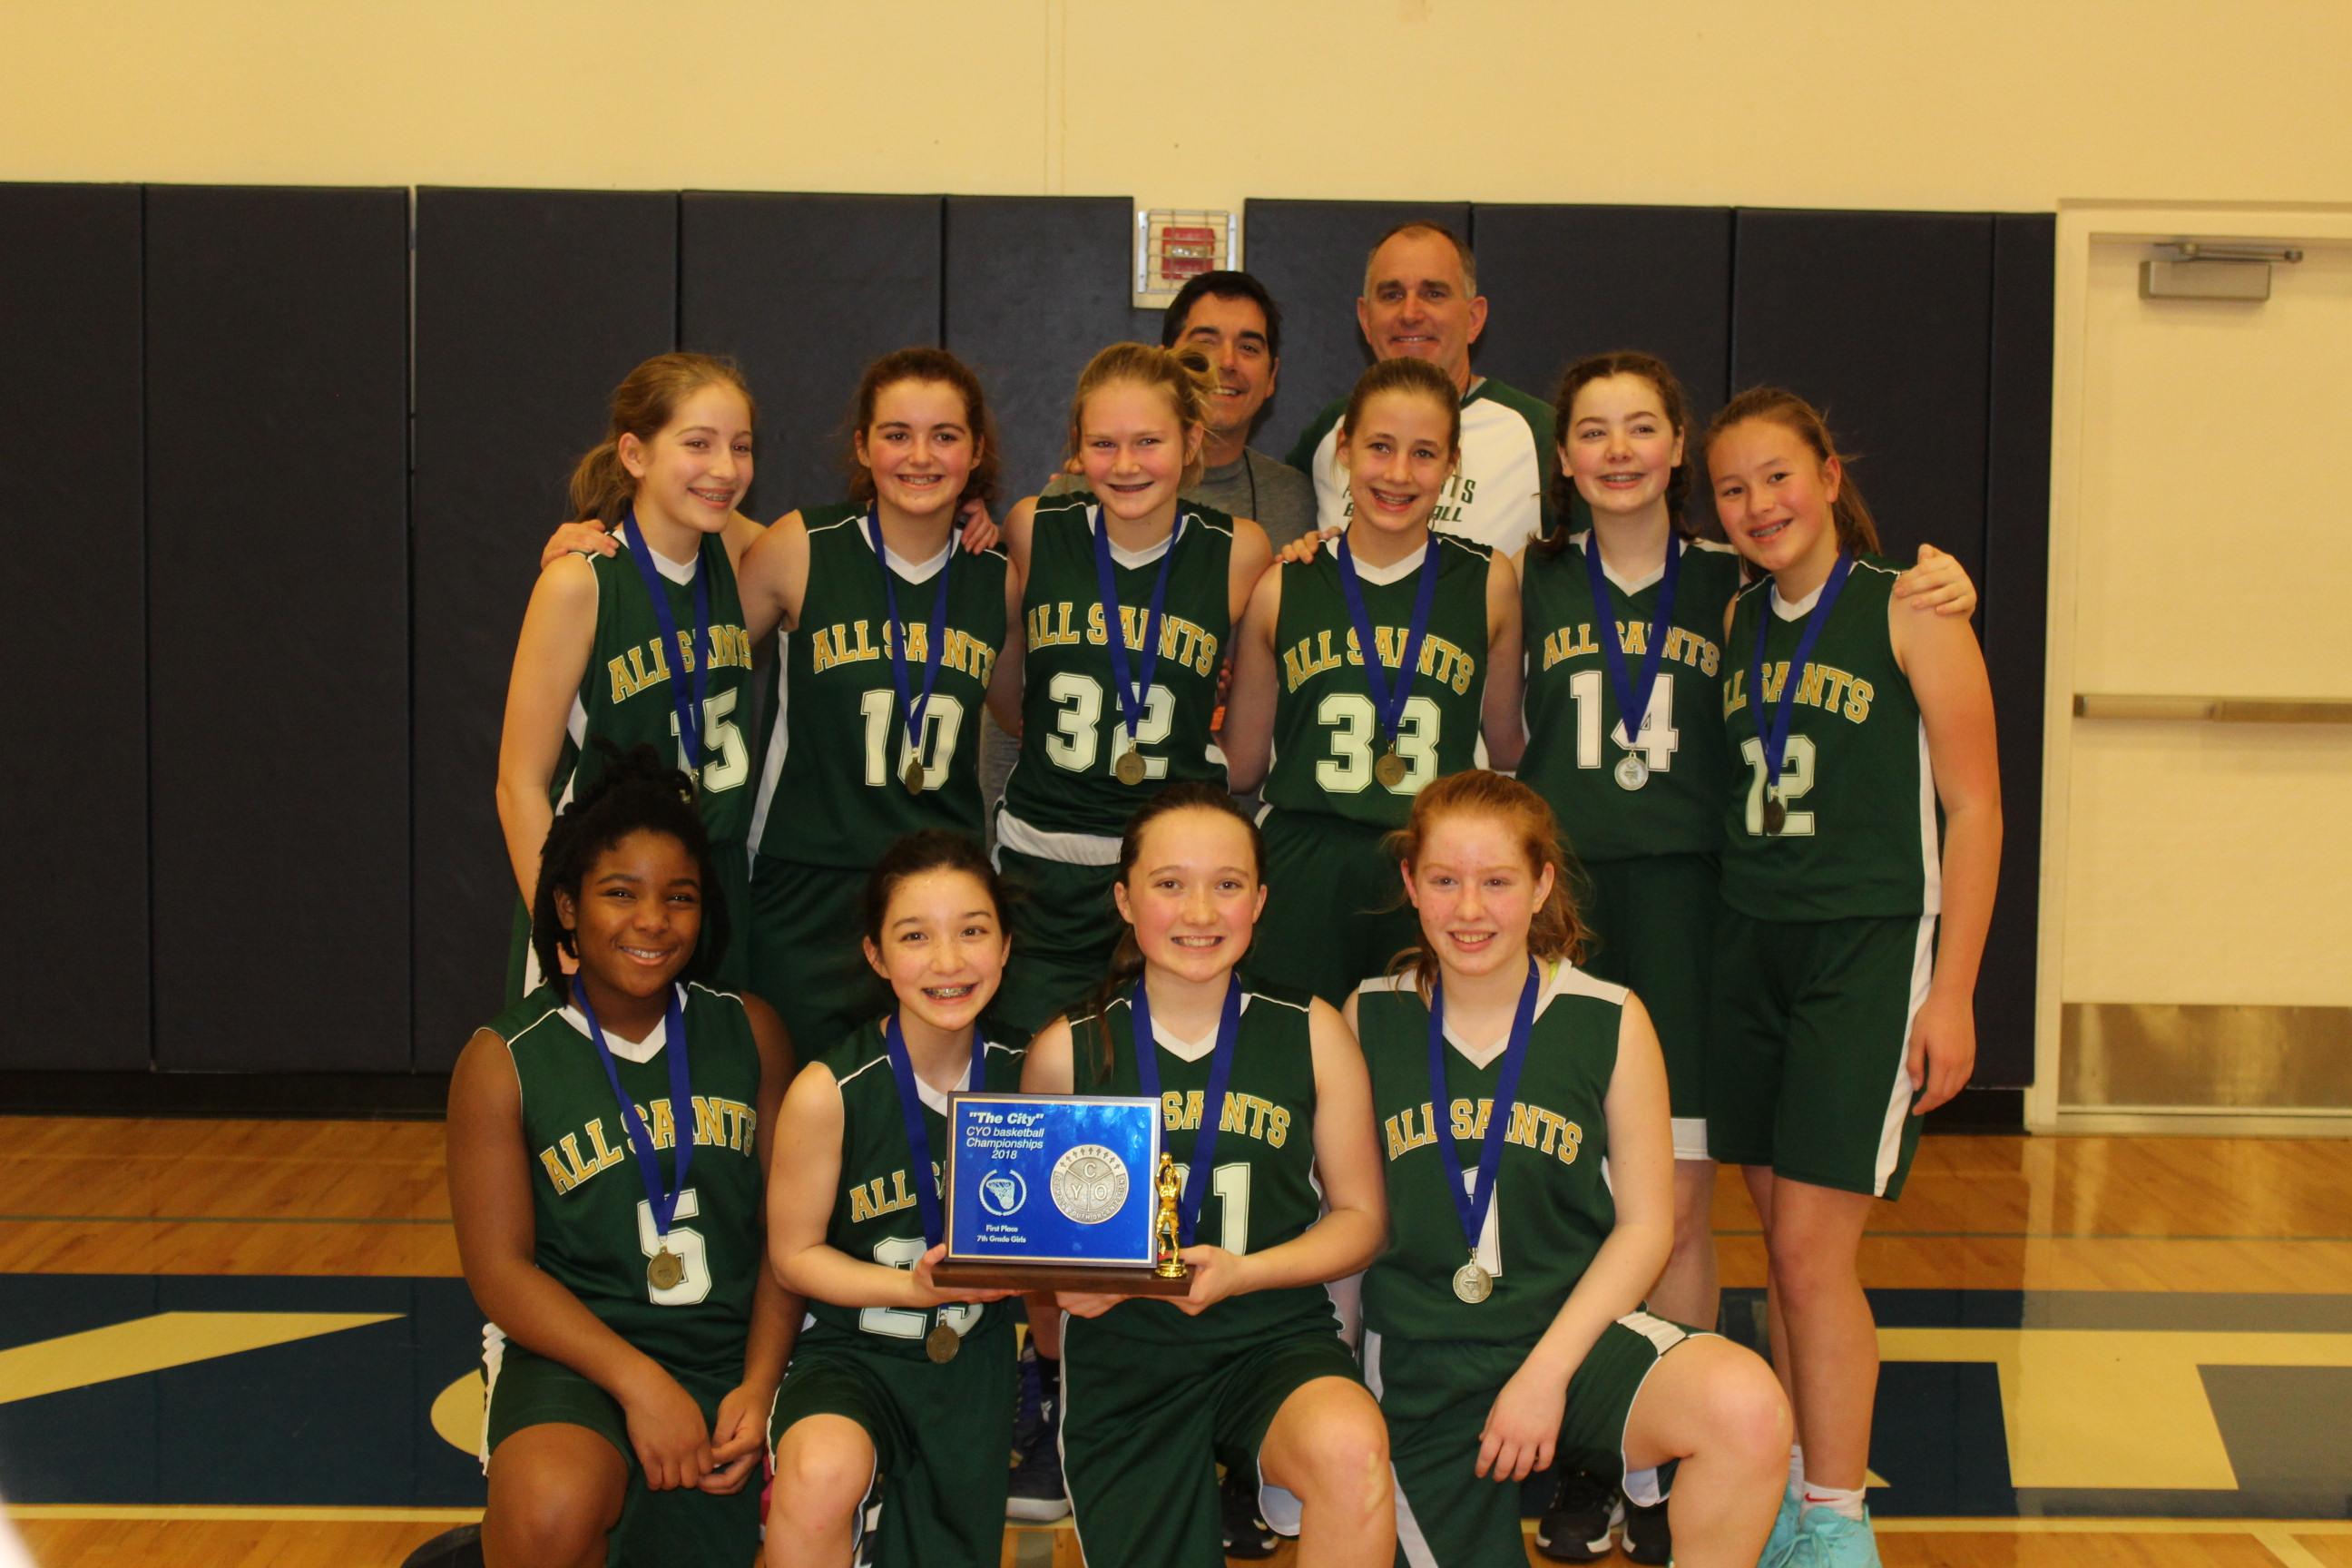 1 All Saints 7th Grade Girls